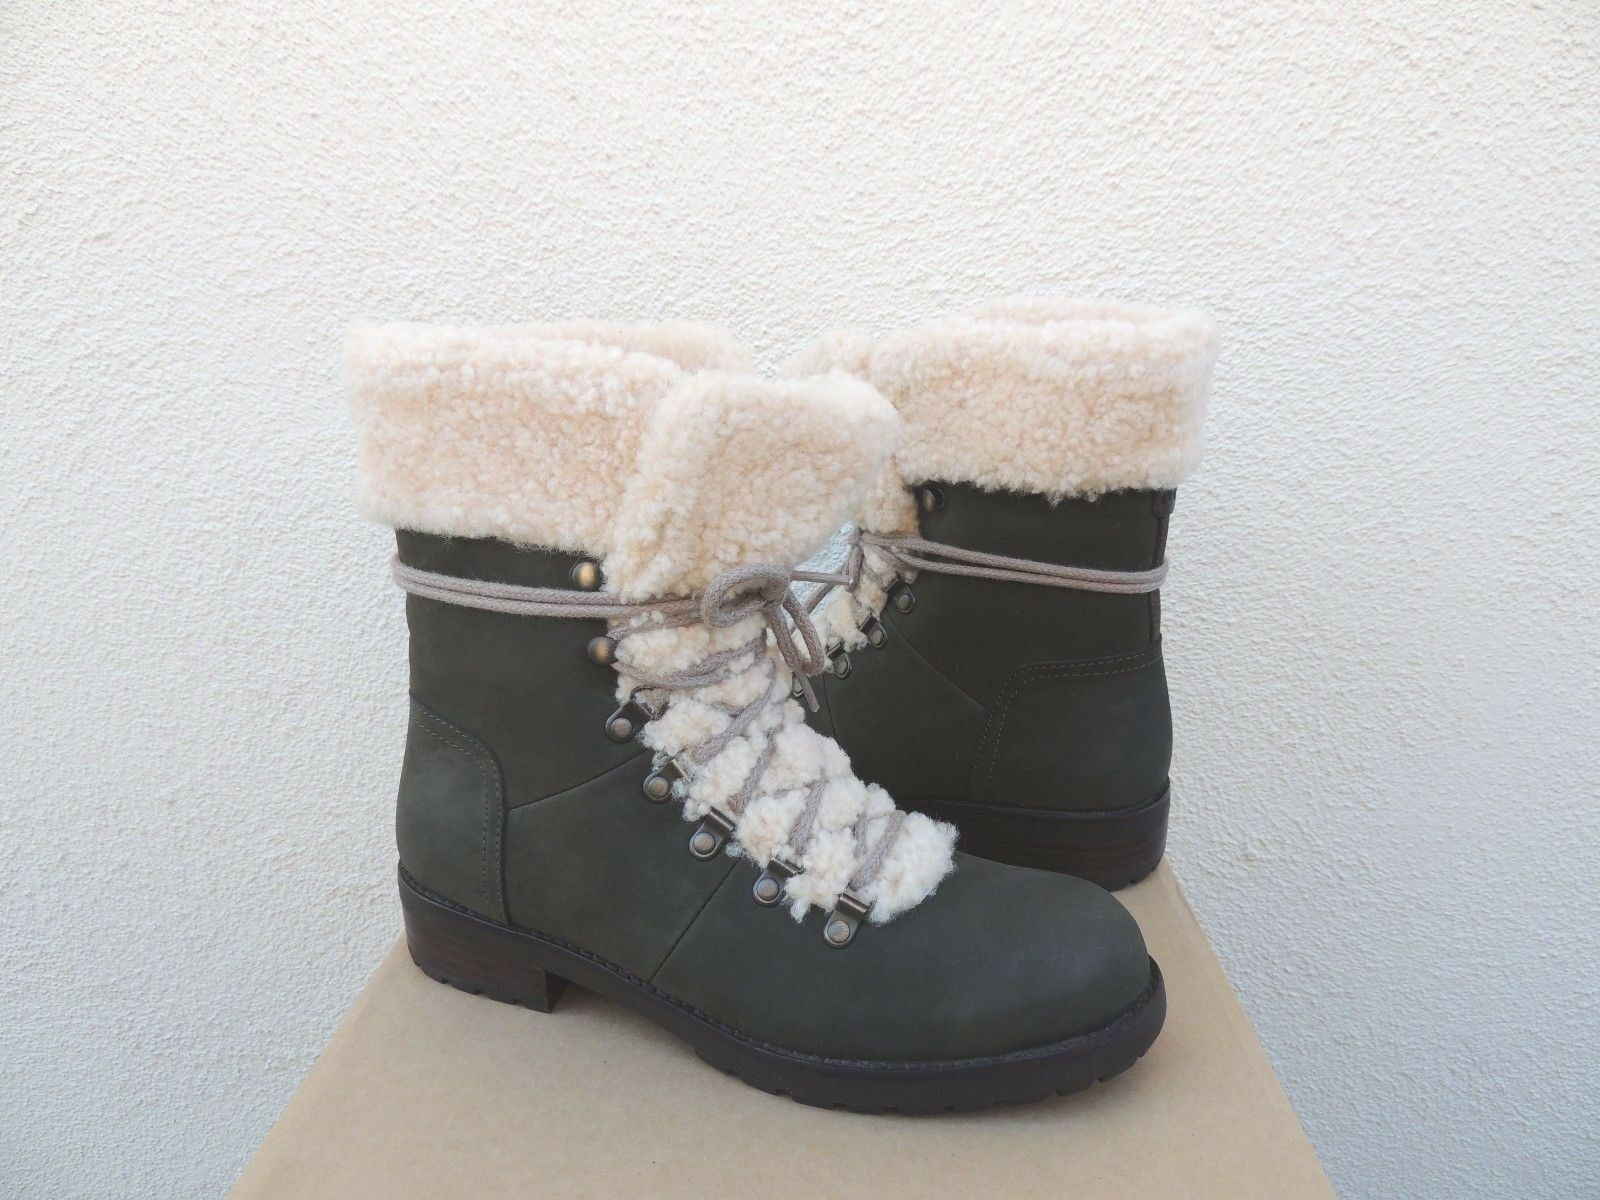 f4a9b8b6f0f UGG Australia 1018896 SLA 10 Women Fraser Leather Lace up Sheepskin BOOTS  Grey